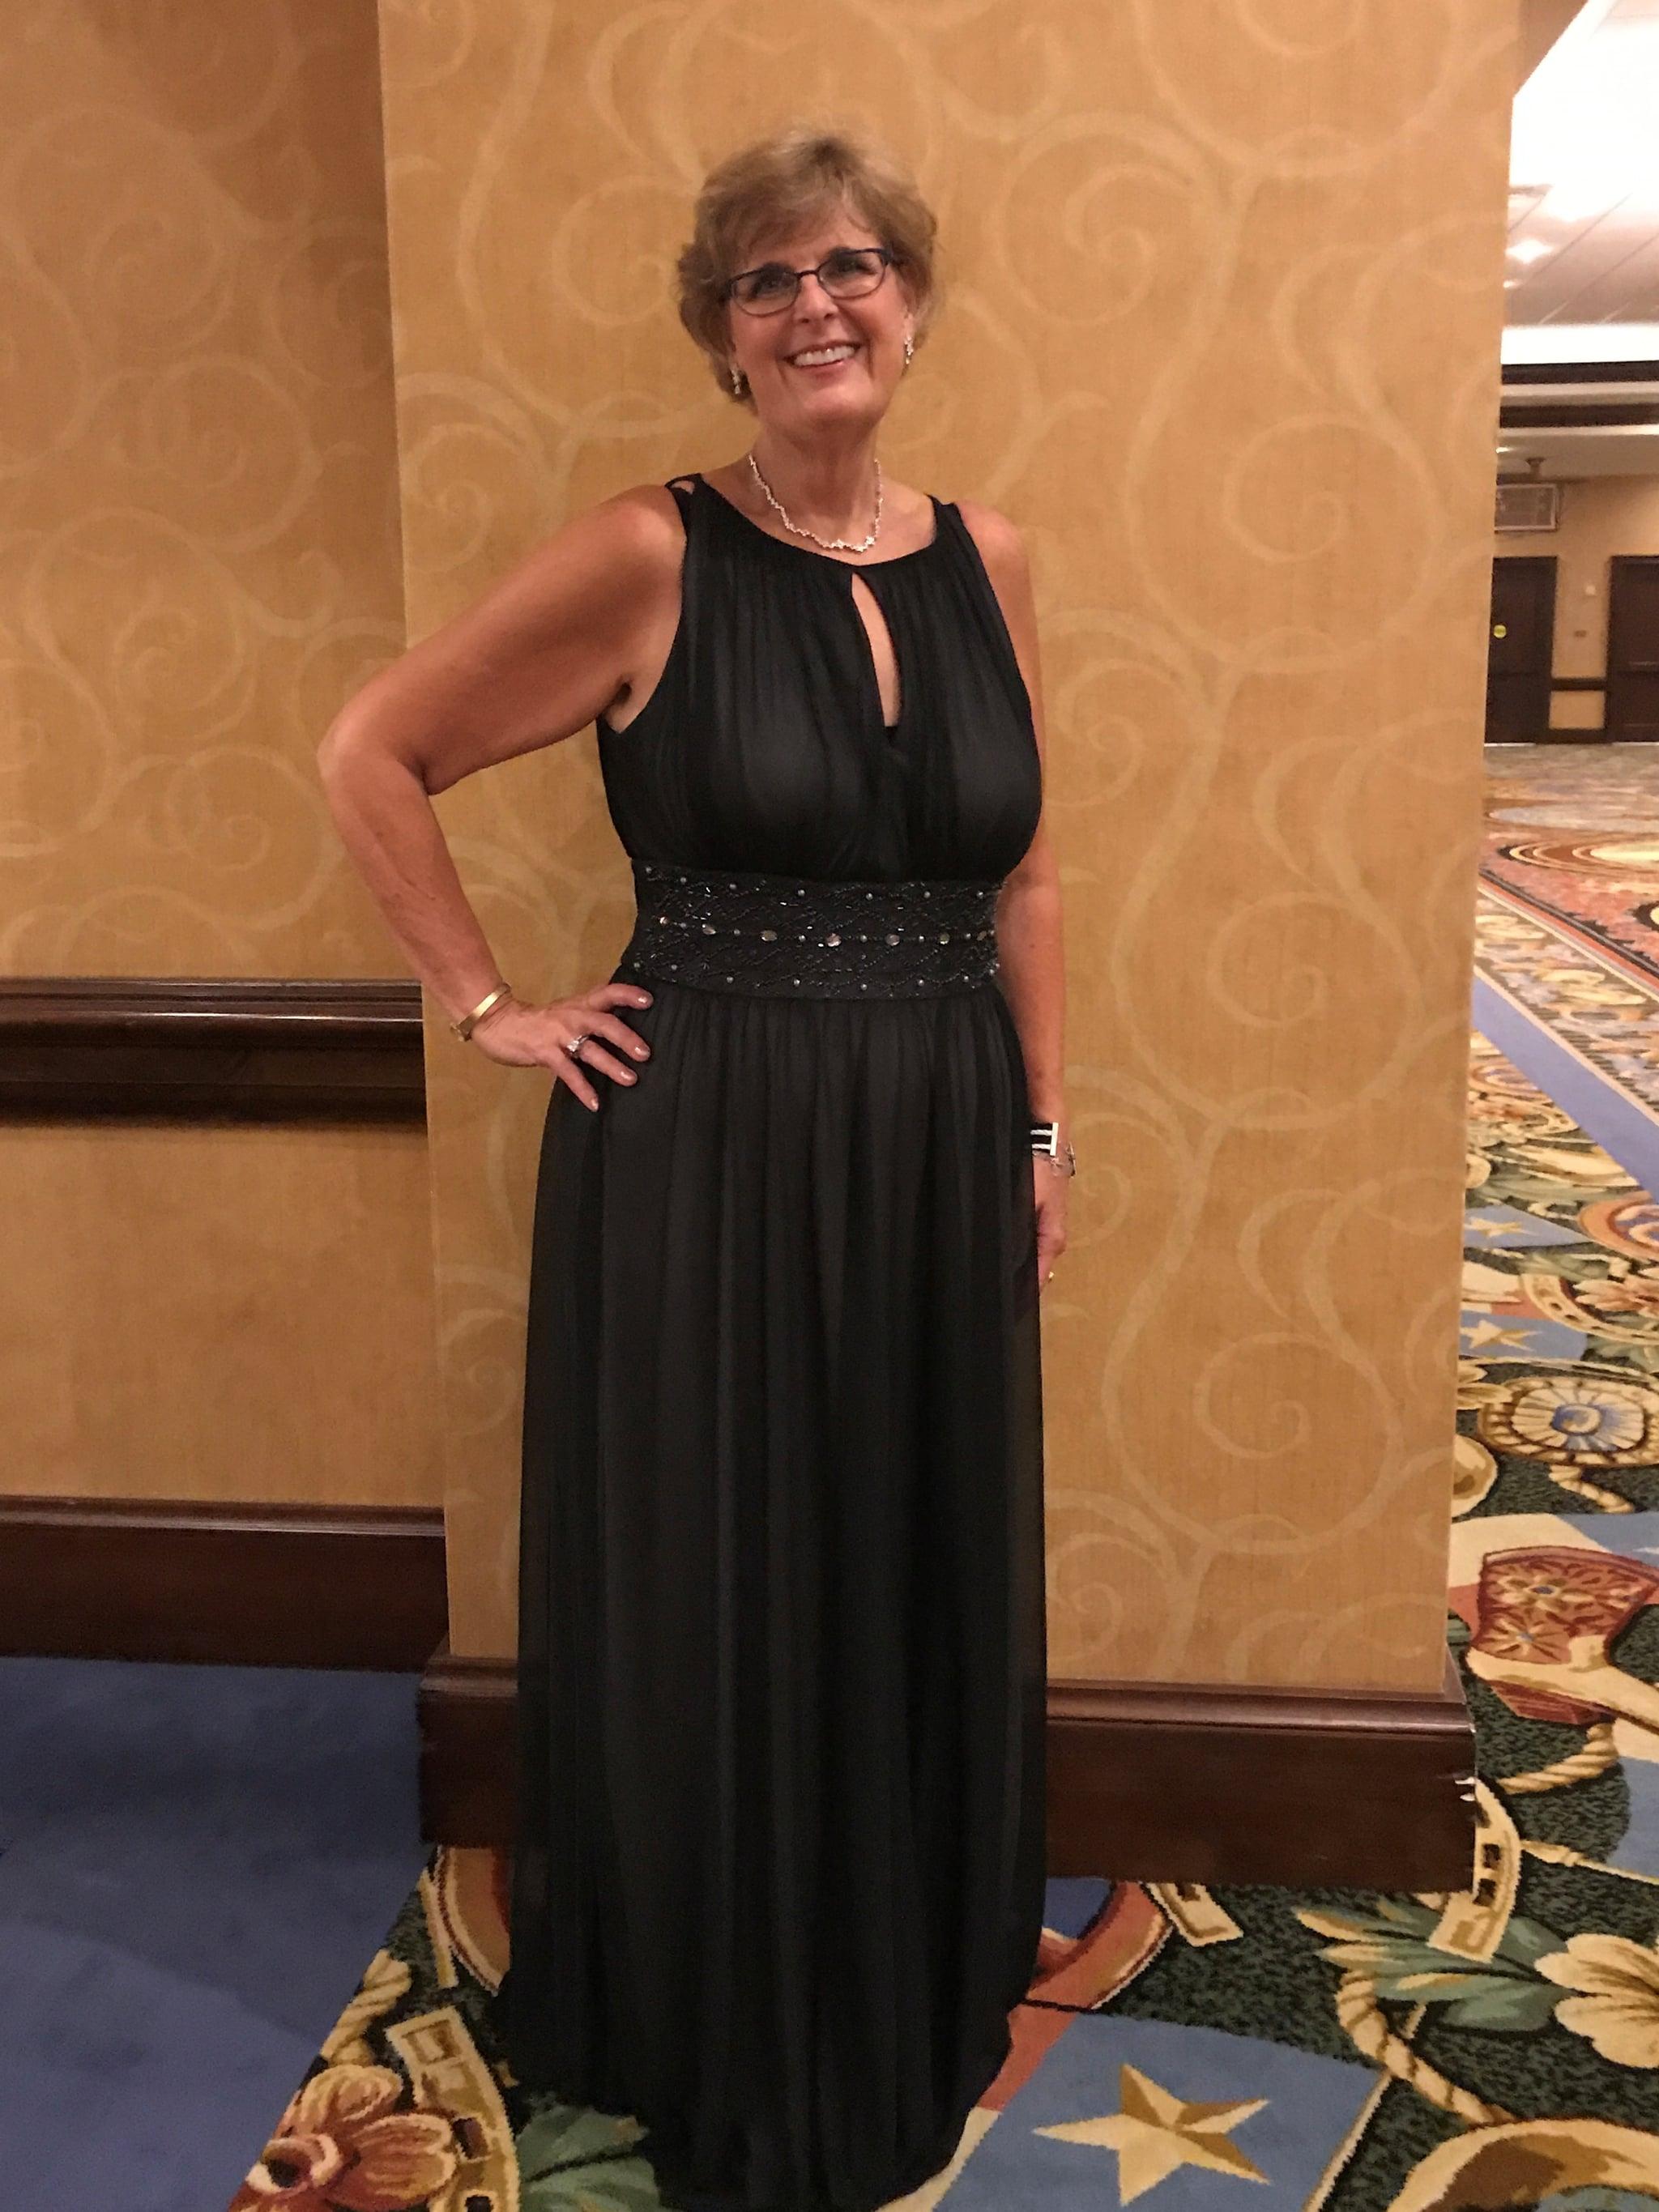 Before and After Weight Loss: Susan Zartman | POPSUGAR Fitness